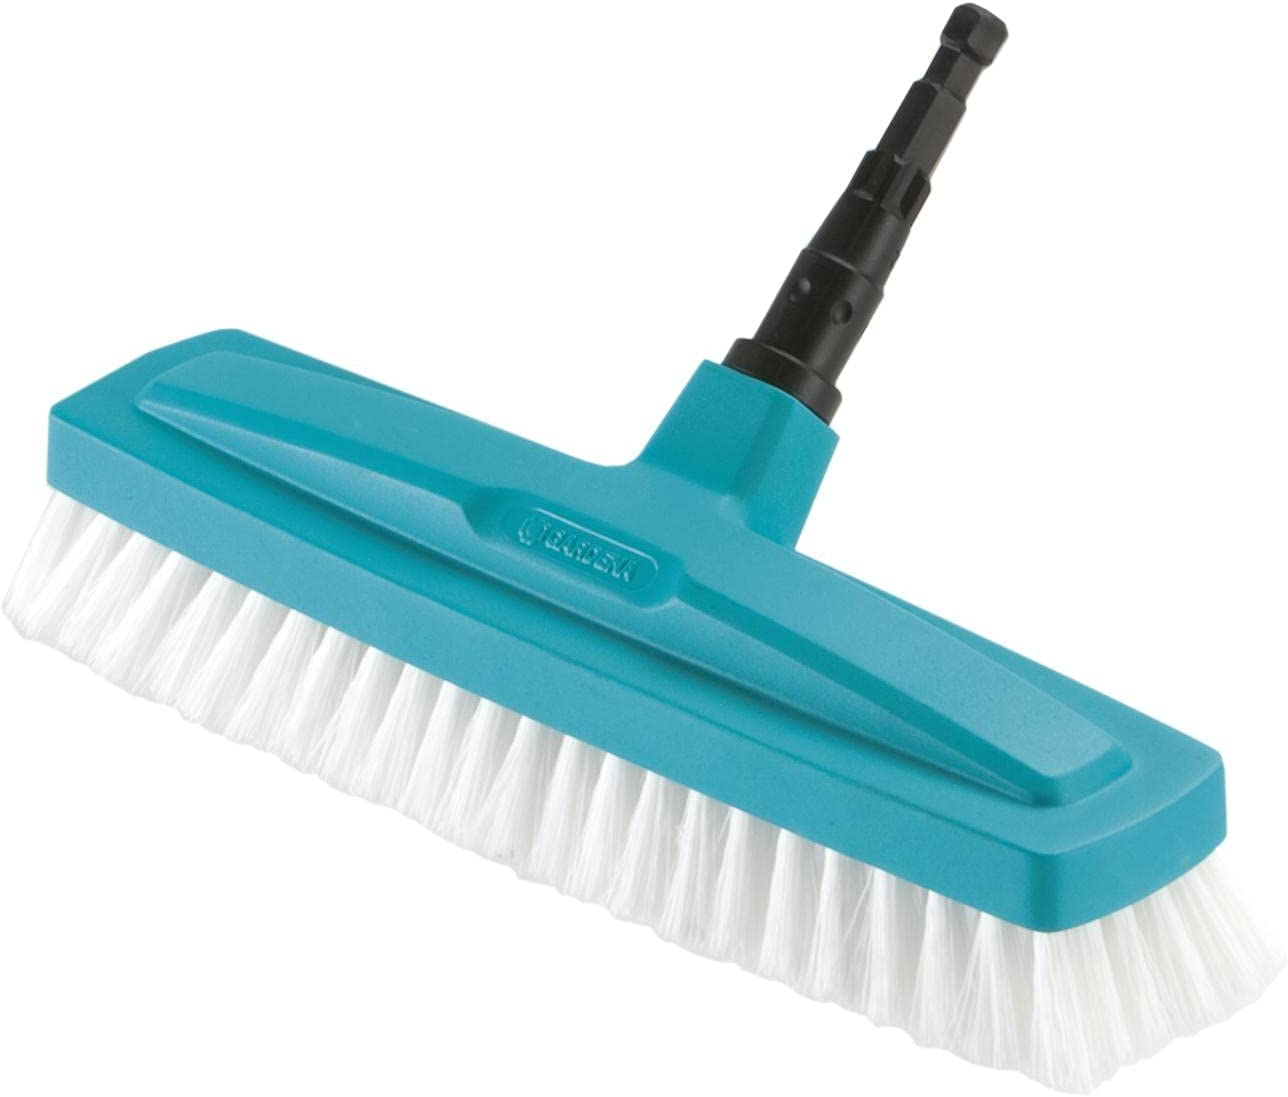 Gardena Outlet SALE Combisystem Overseas parallel import regular item Scrubbing Brush 30 White Black 35x cm Blue